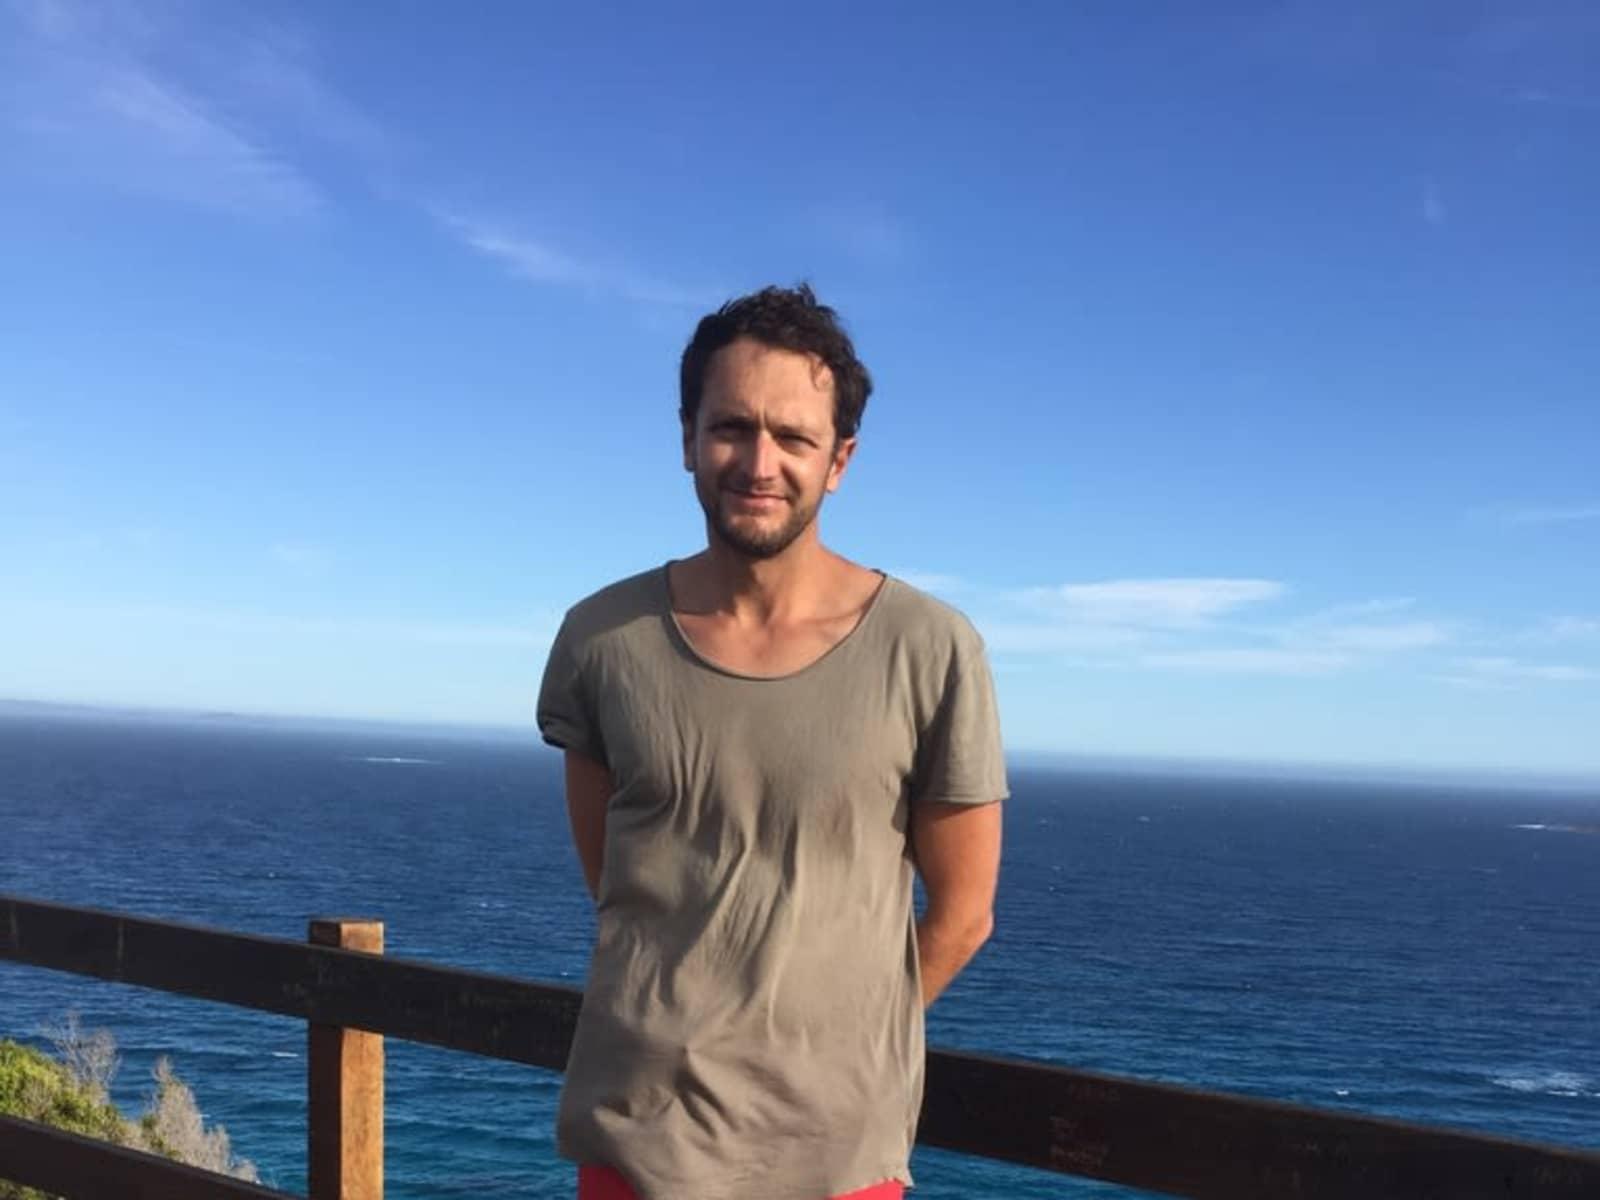 Alexander from Perth, Western Australia, Australia